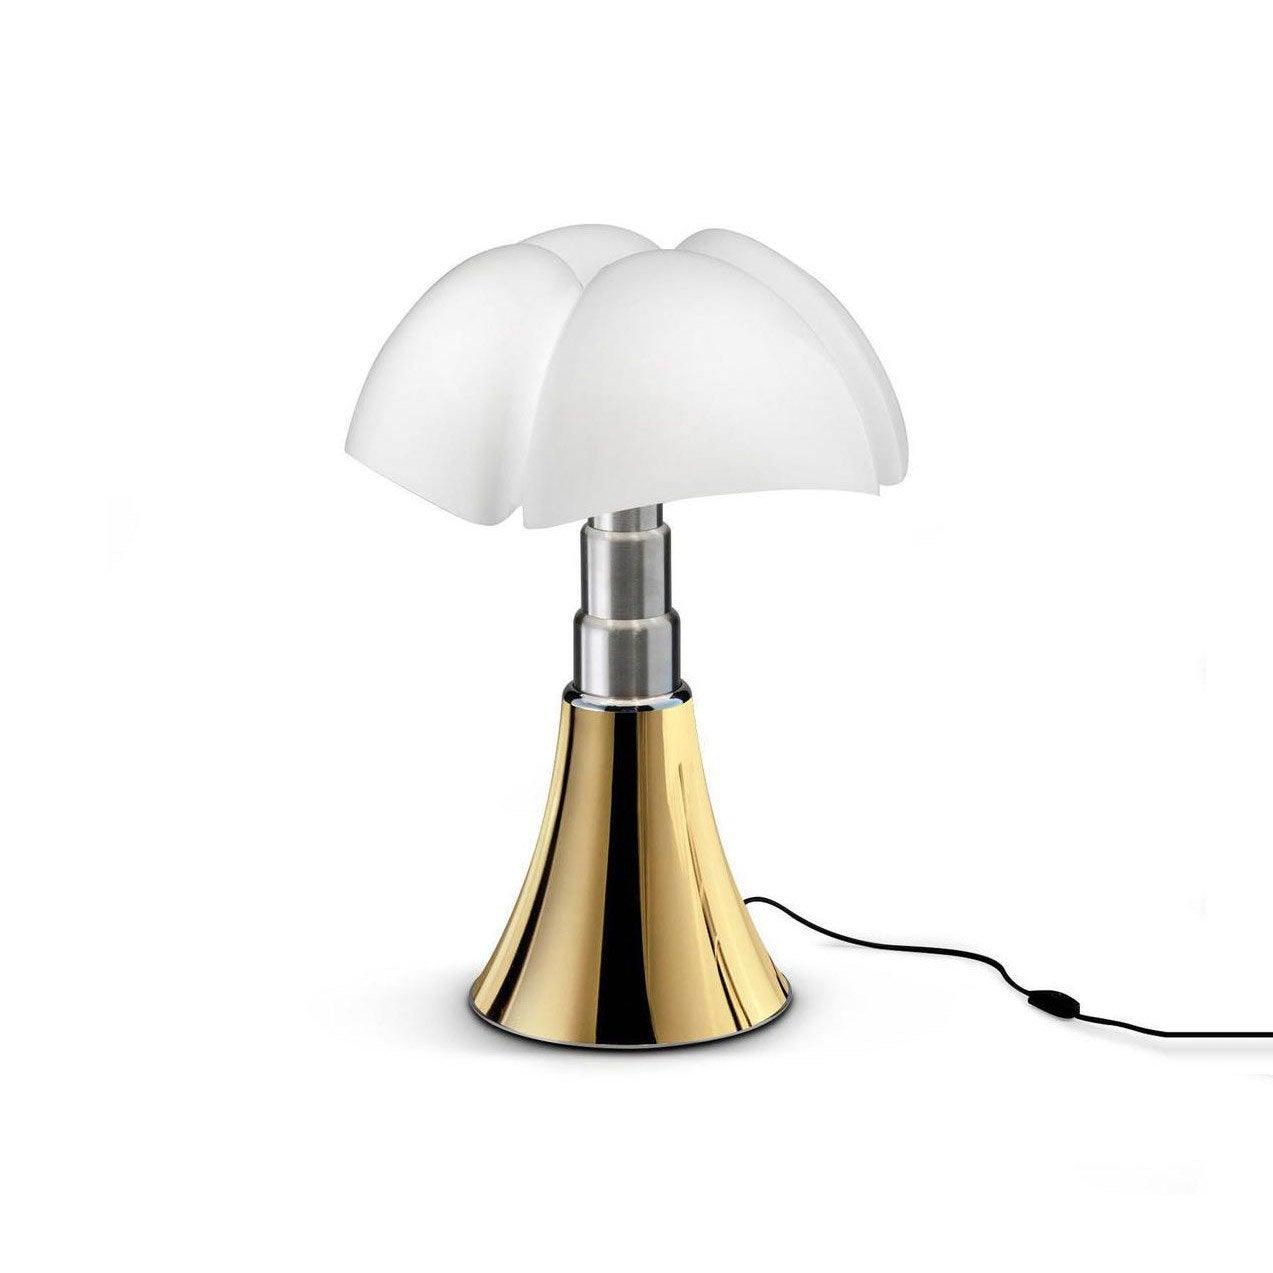 Pipistrello Led DoréAmpoule Lampe Mini 35cm Design IntegréeH OXiTkZPu